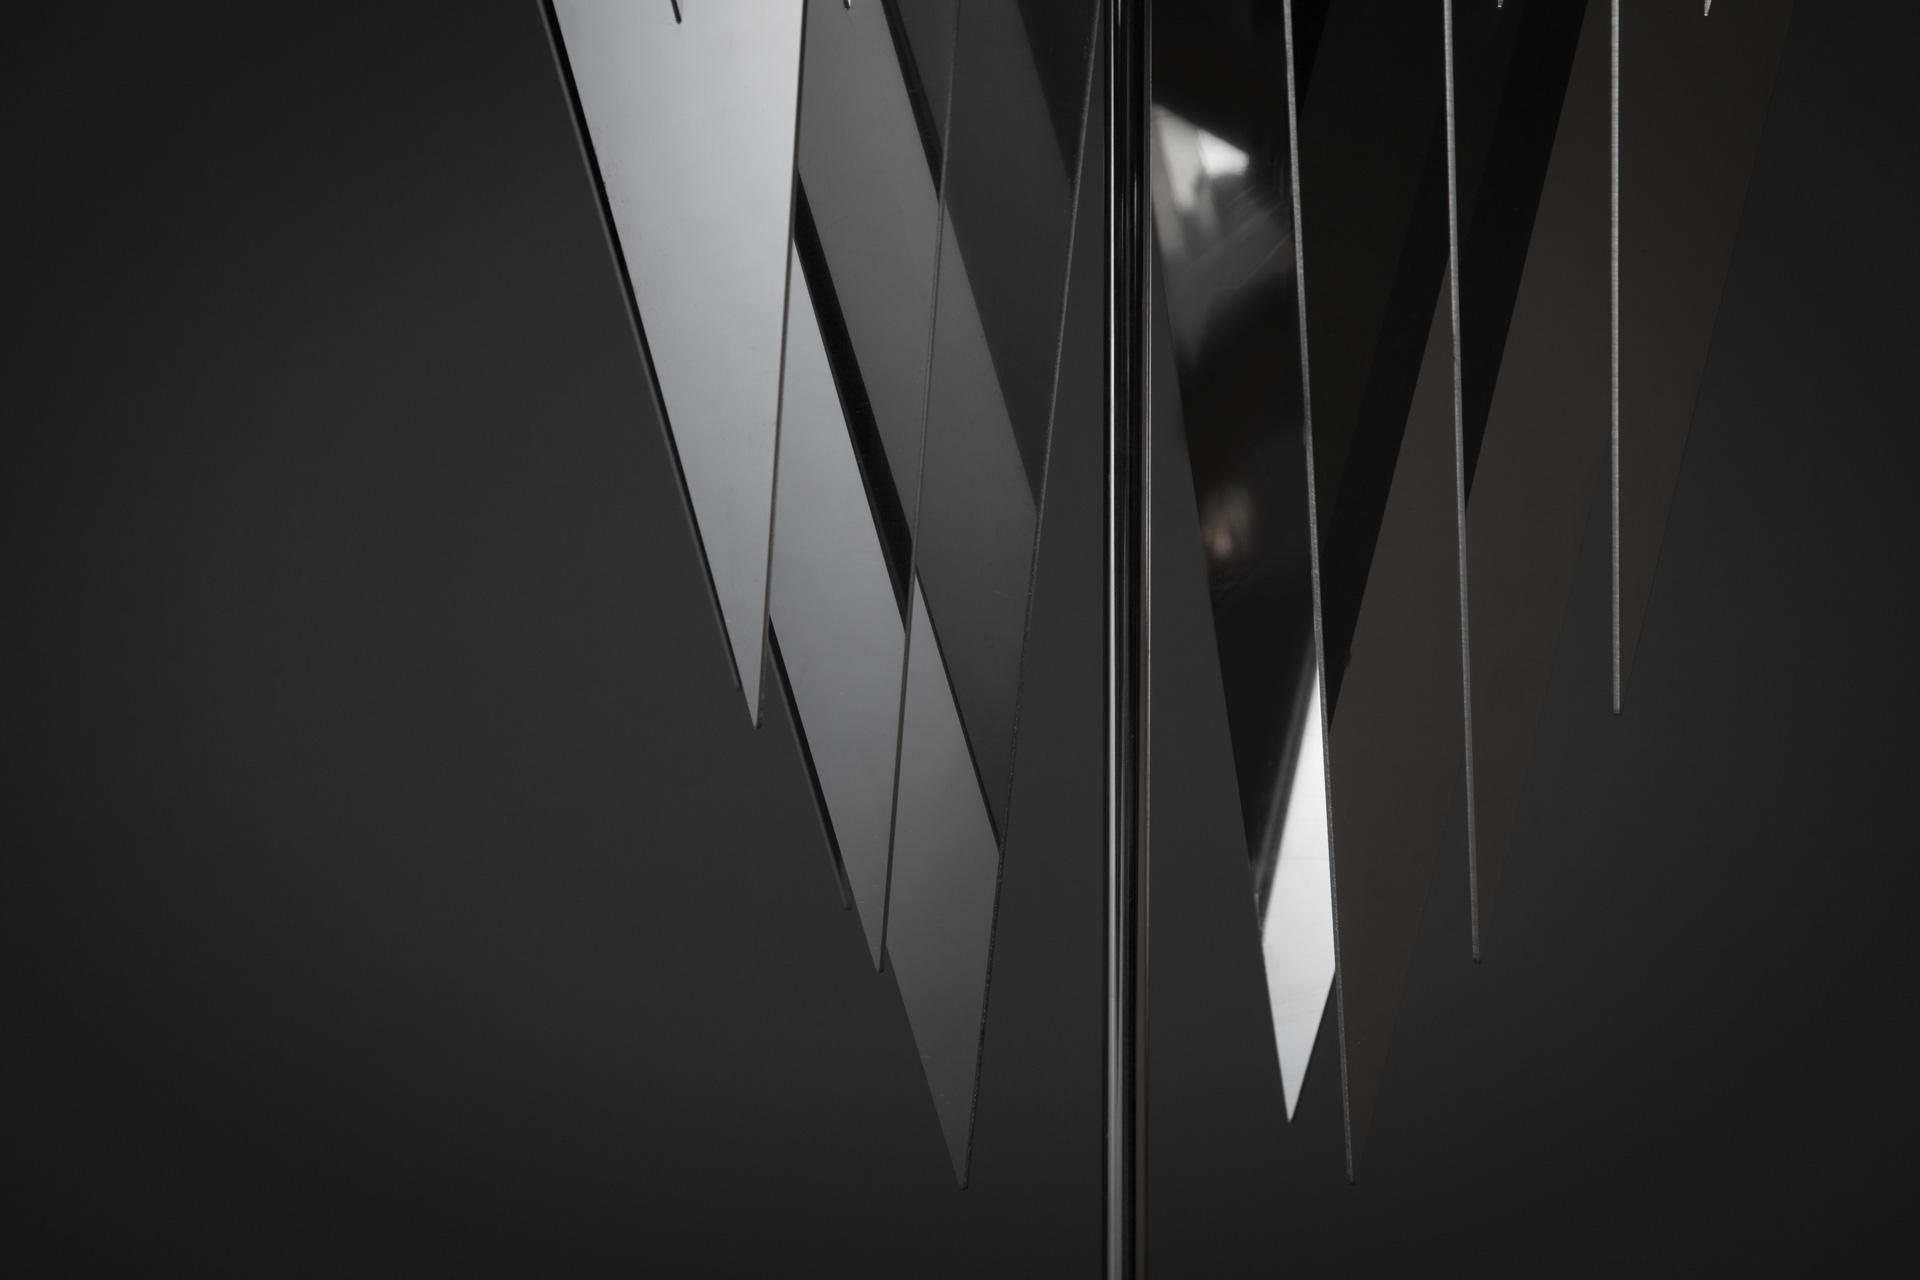 skeld-design-nightfall-floor-04.jpg